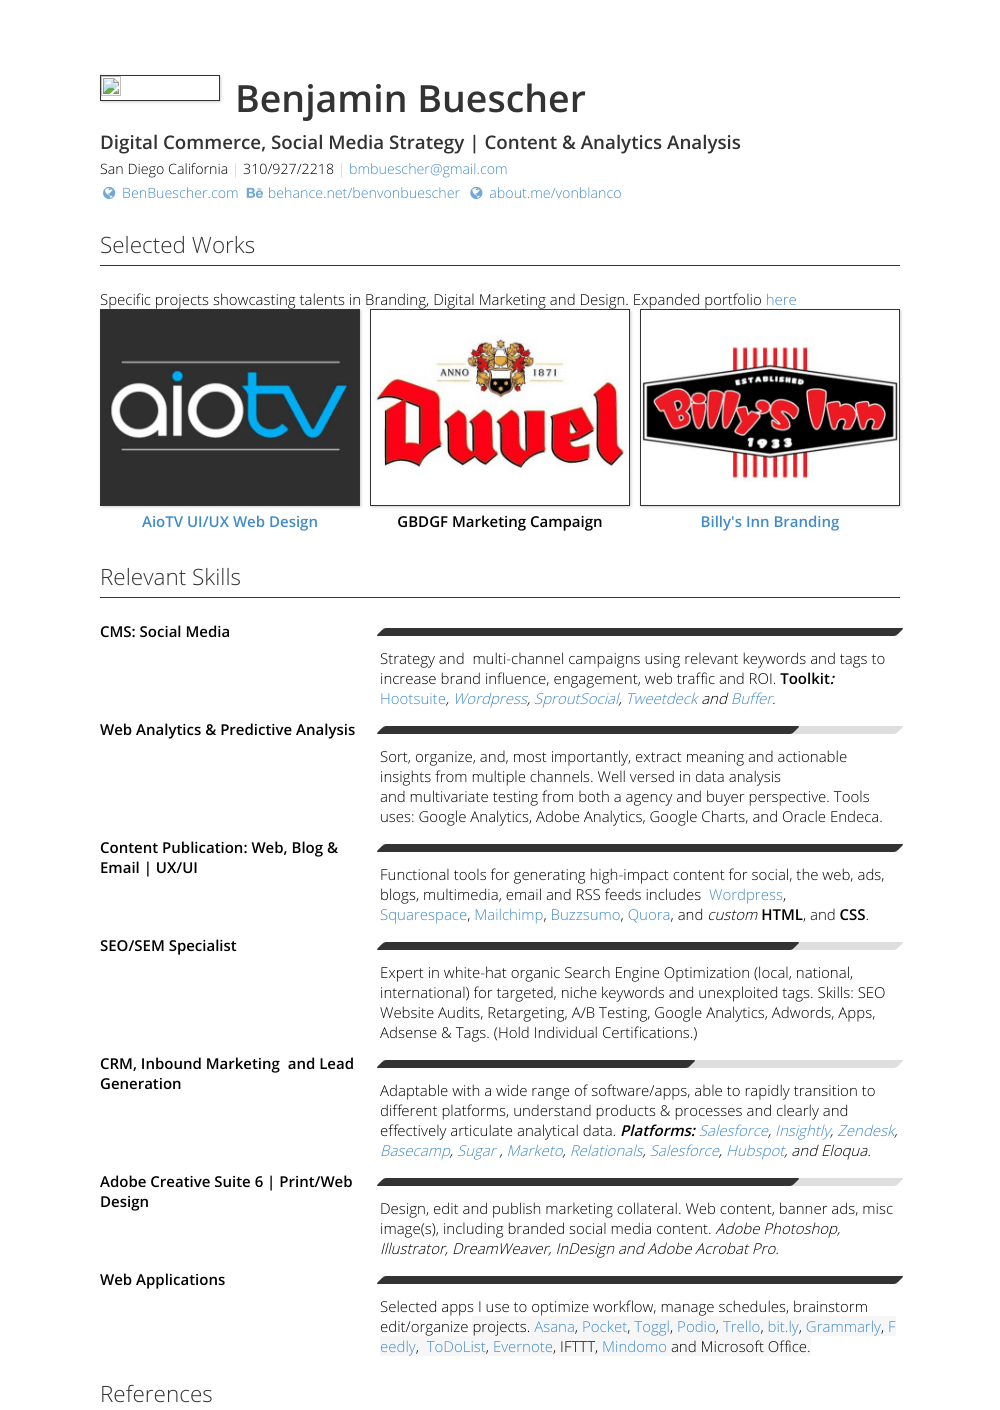 Online Marketing Resume Samples & Templates VisualCV